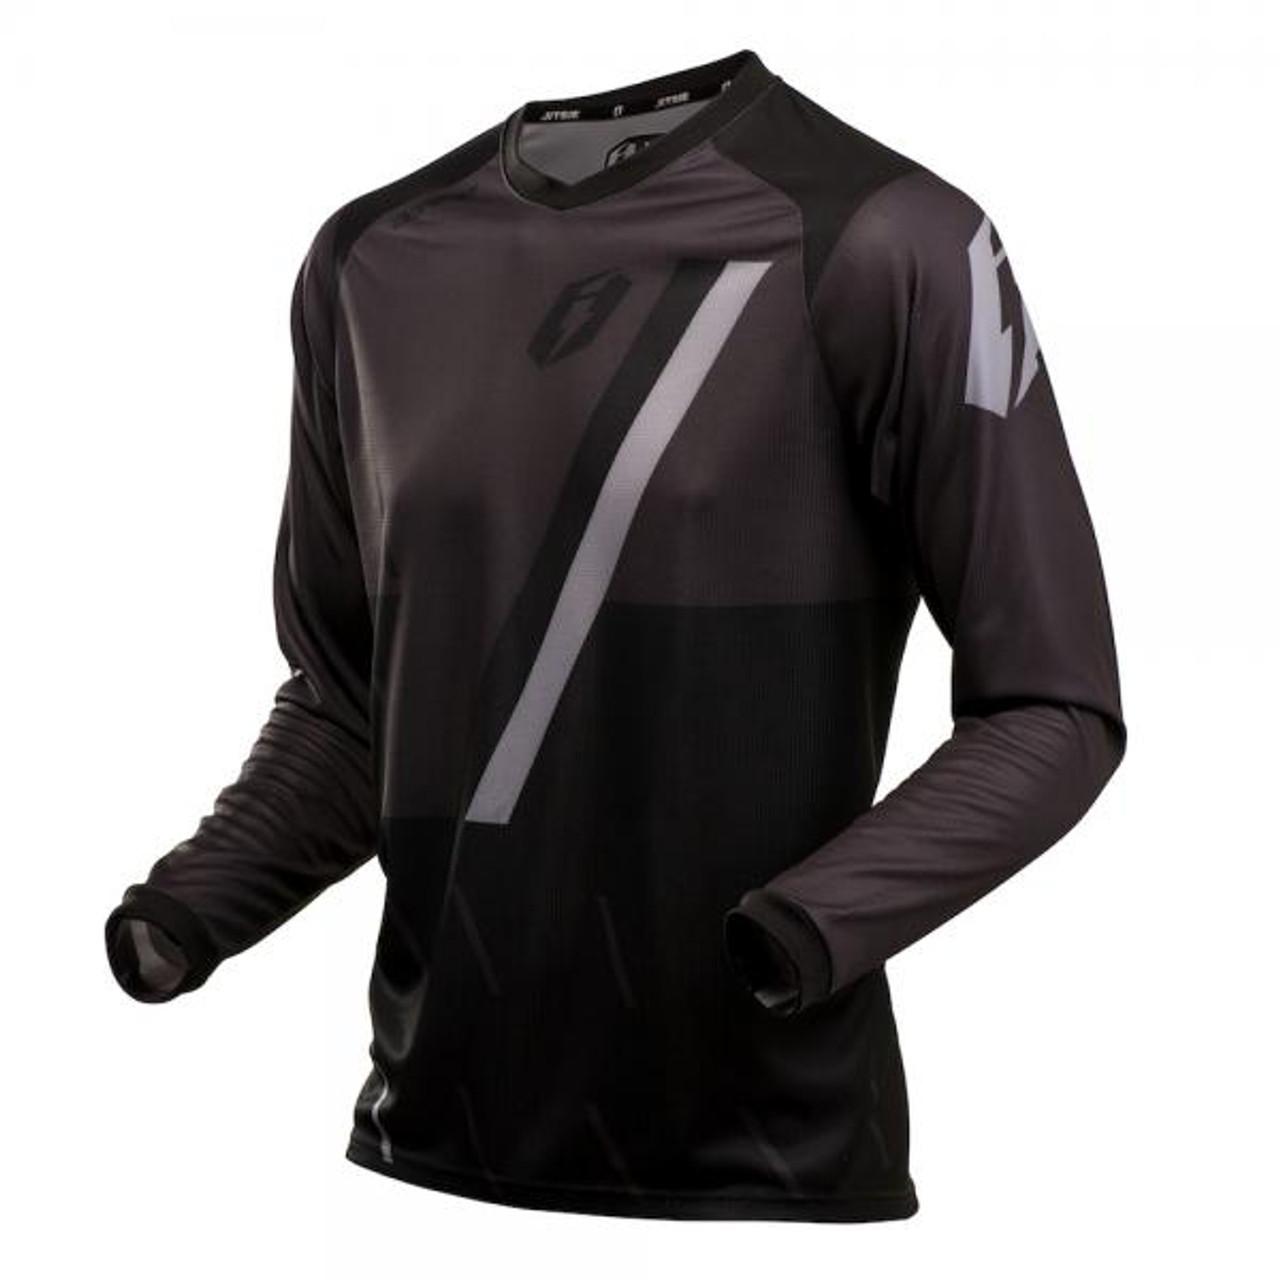 Jersey L3 Domino, black/grey/ silver